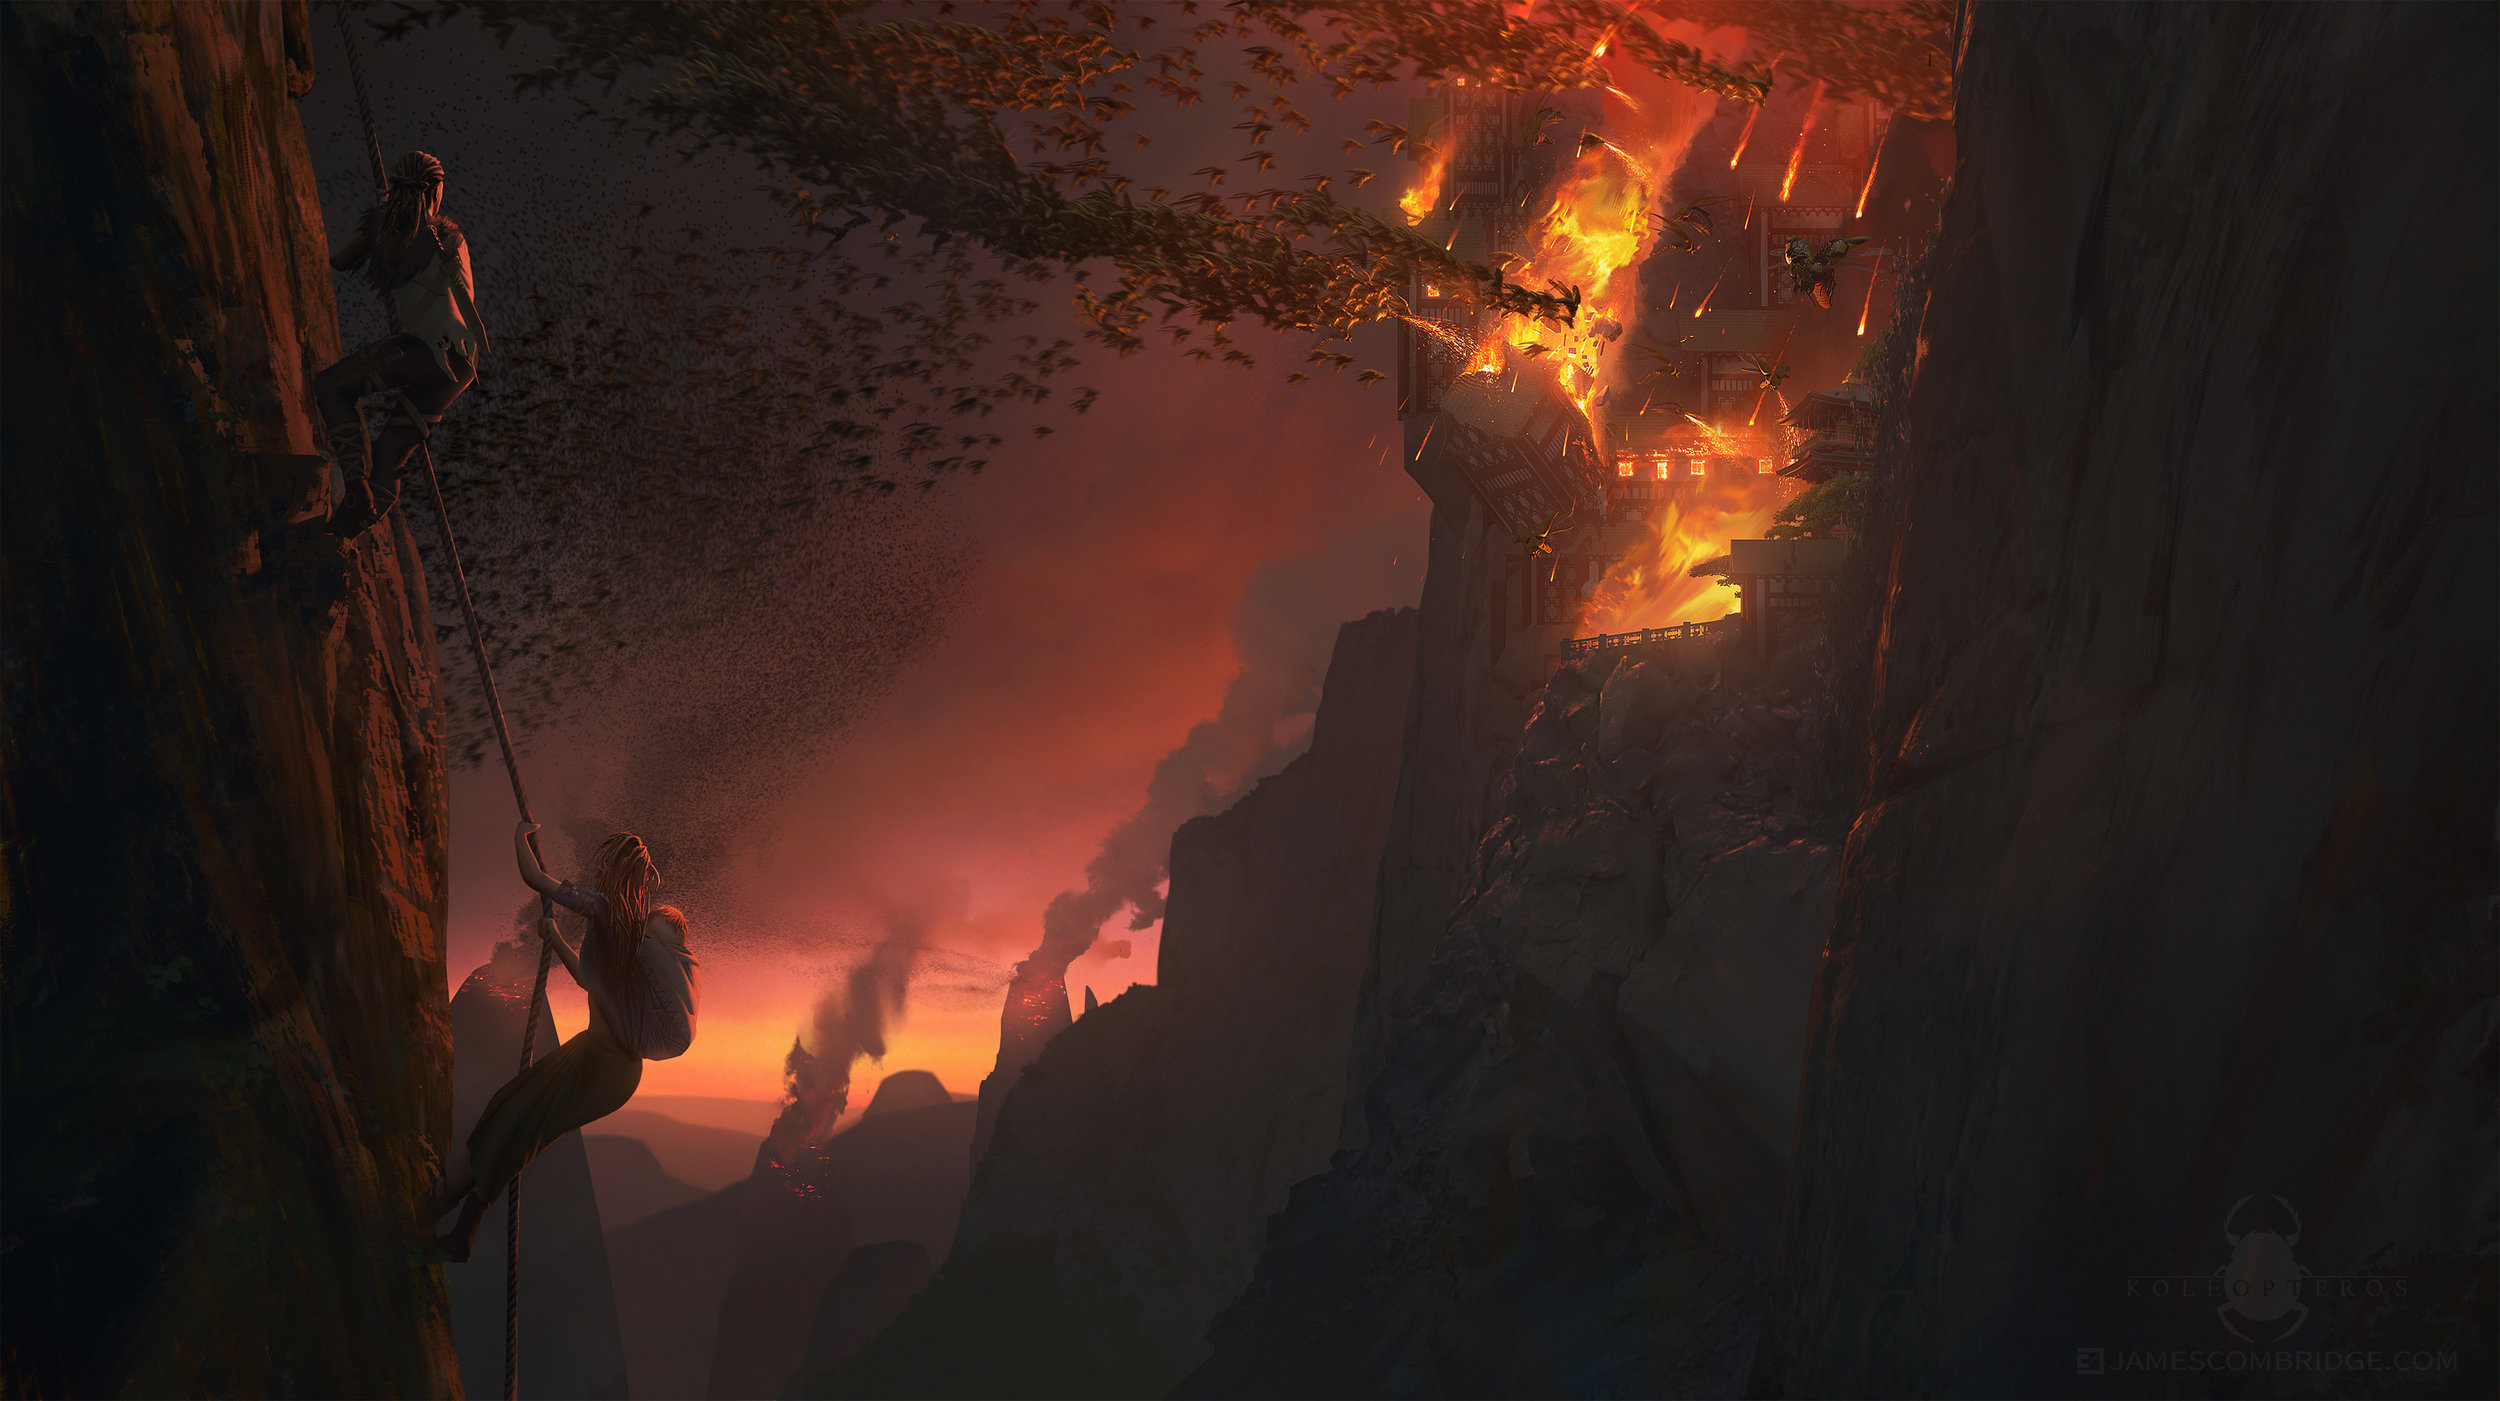 1402-escaping-the-inferno-james-combridge